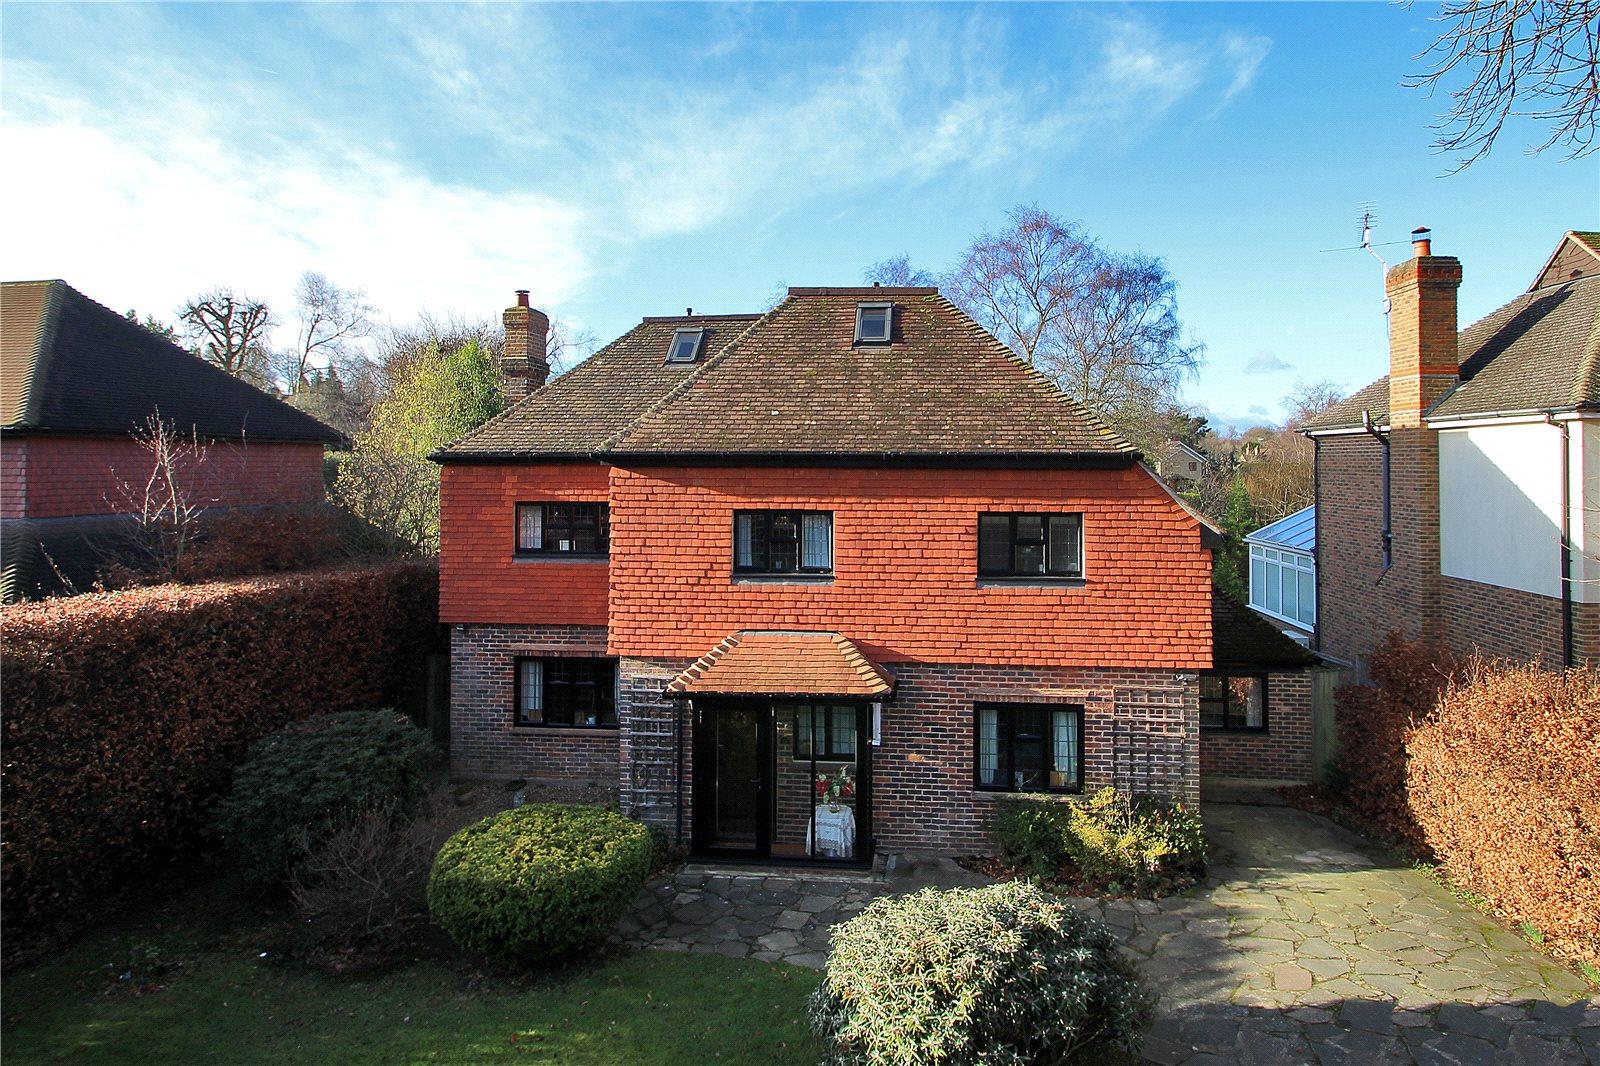 Частный дом для того Продажа на The Rise, Sevenoaks, Kent, TN13 Sevenoaks, Англия